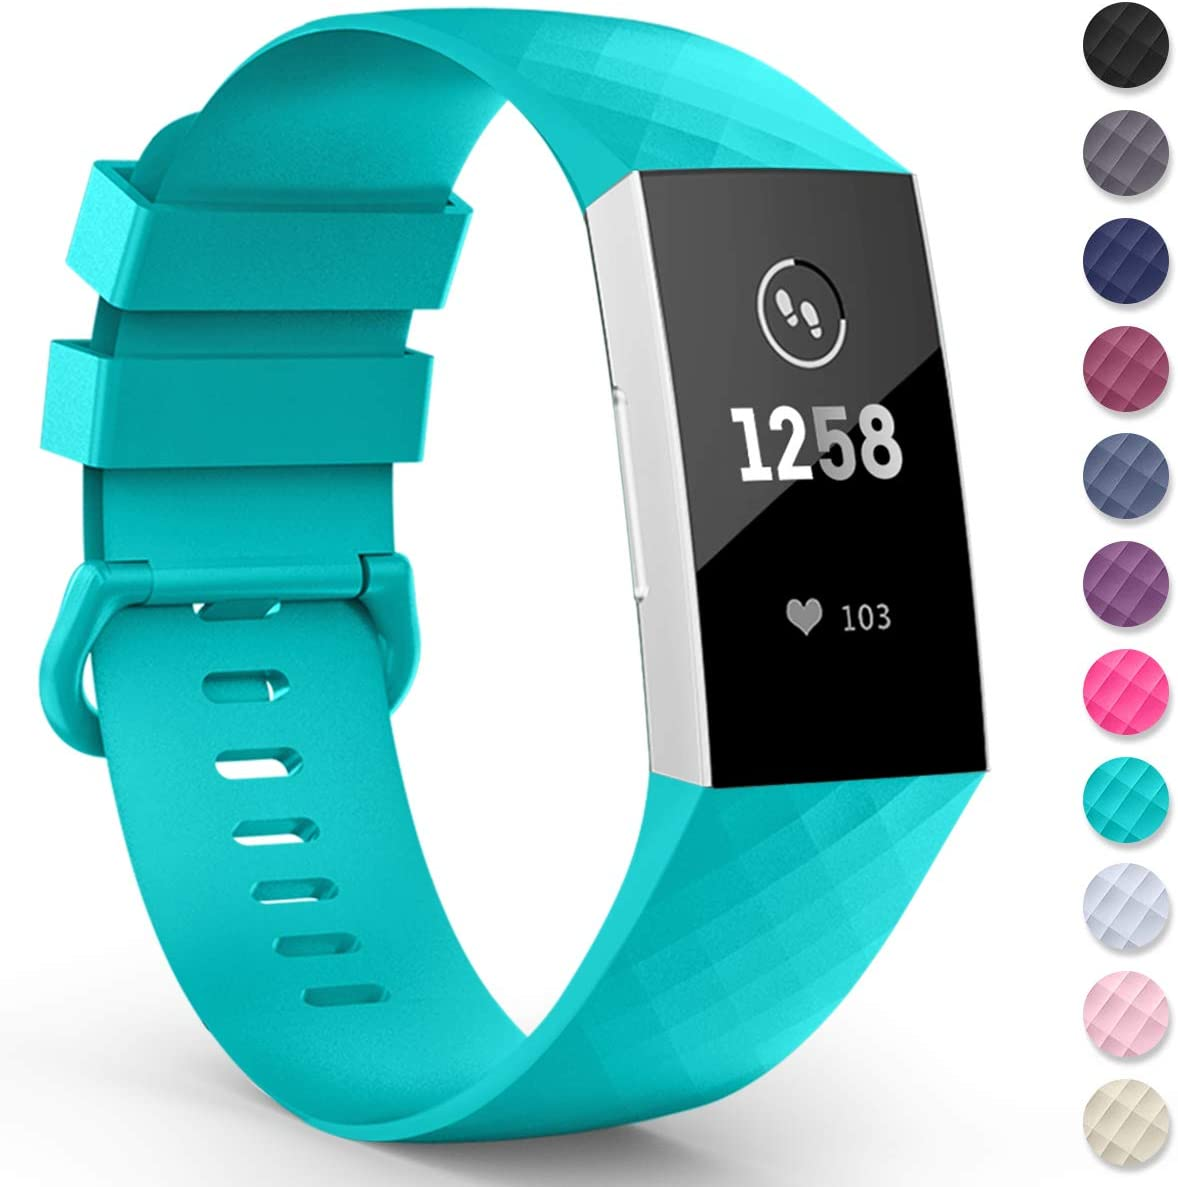 2x Sportarmband für Fitbit Charge 3 4 Fitnesstracker Smartwatch Sport Armband